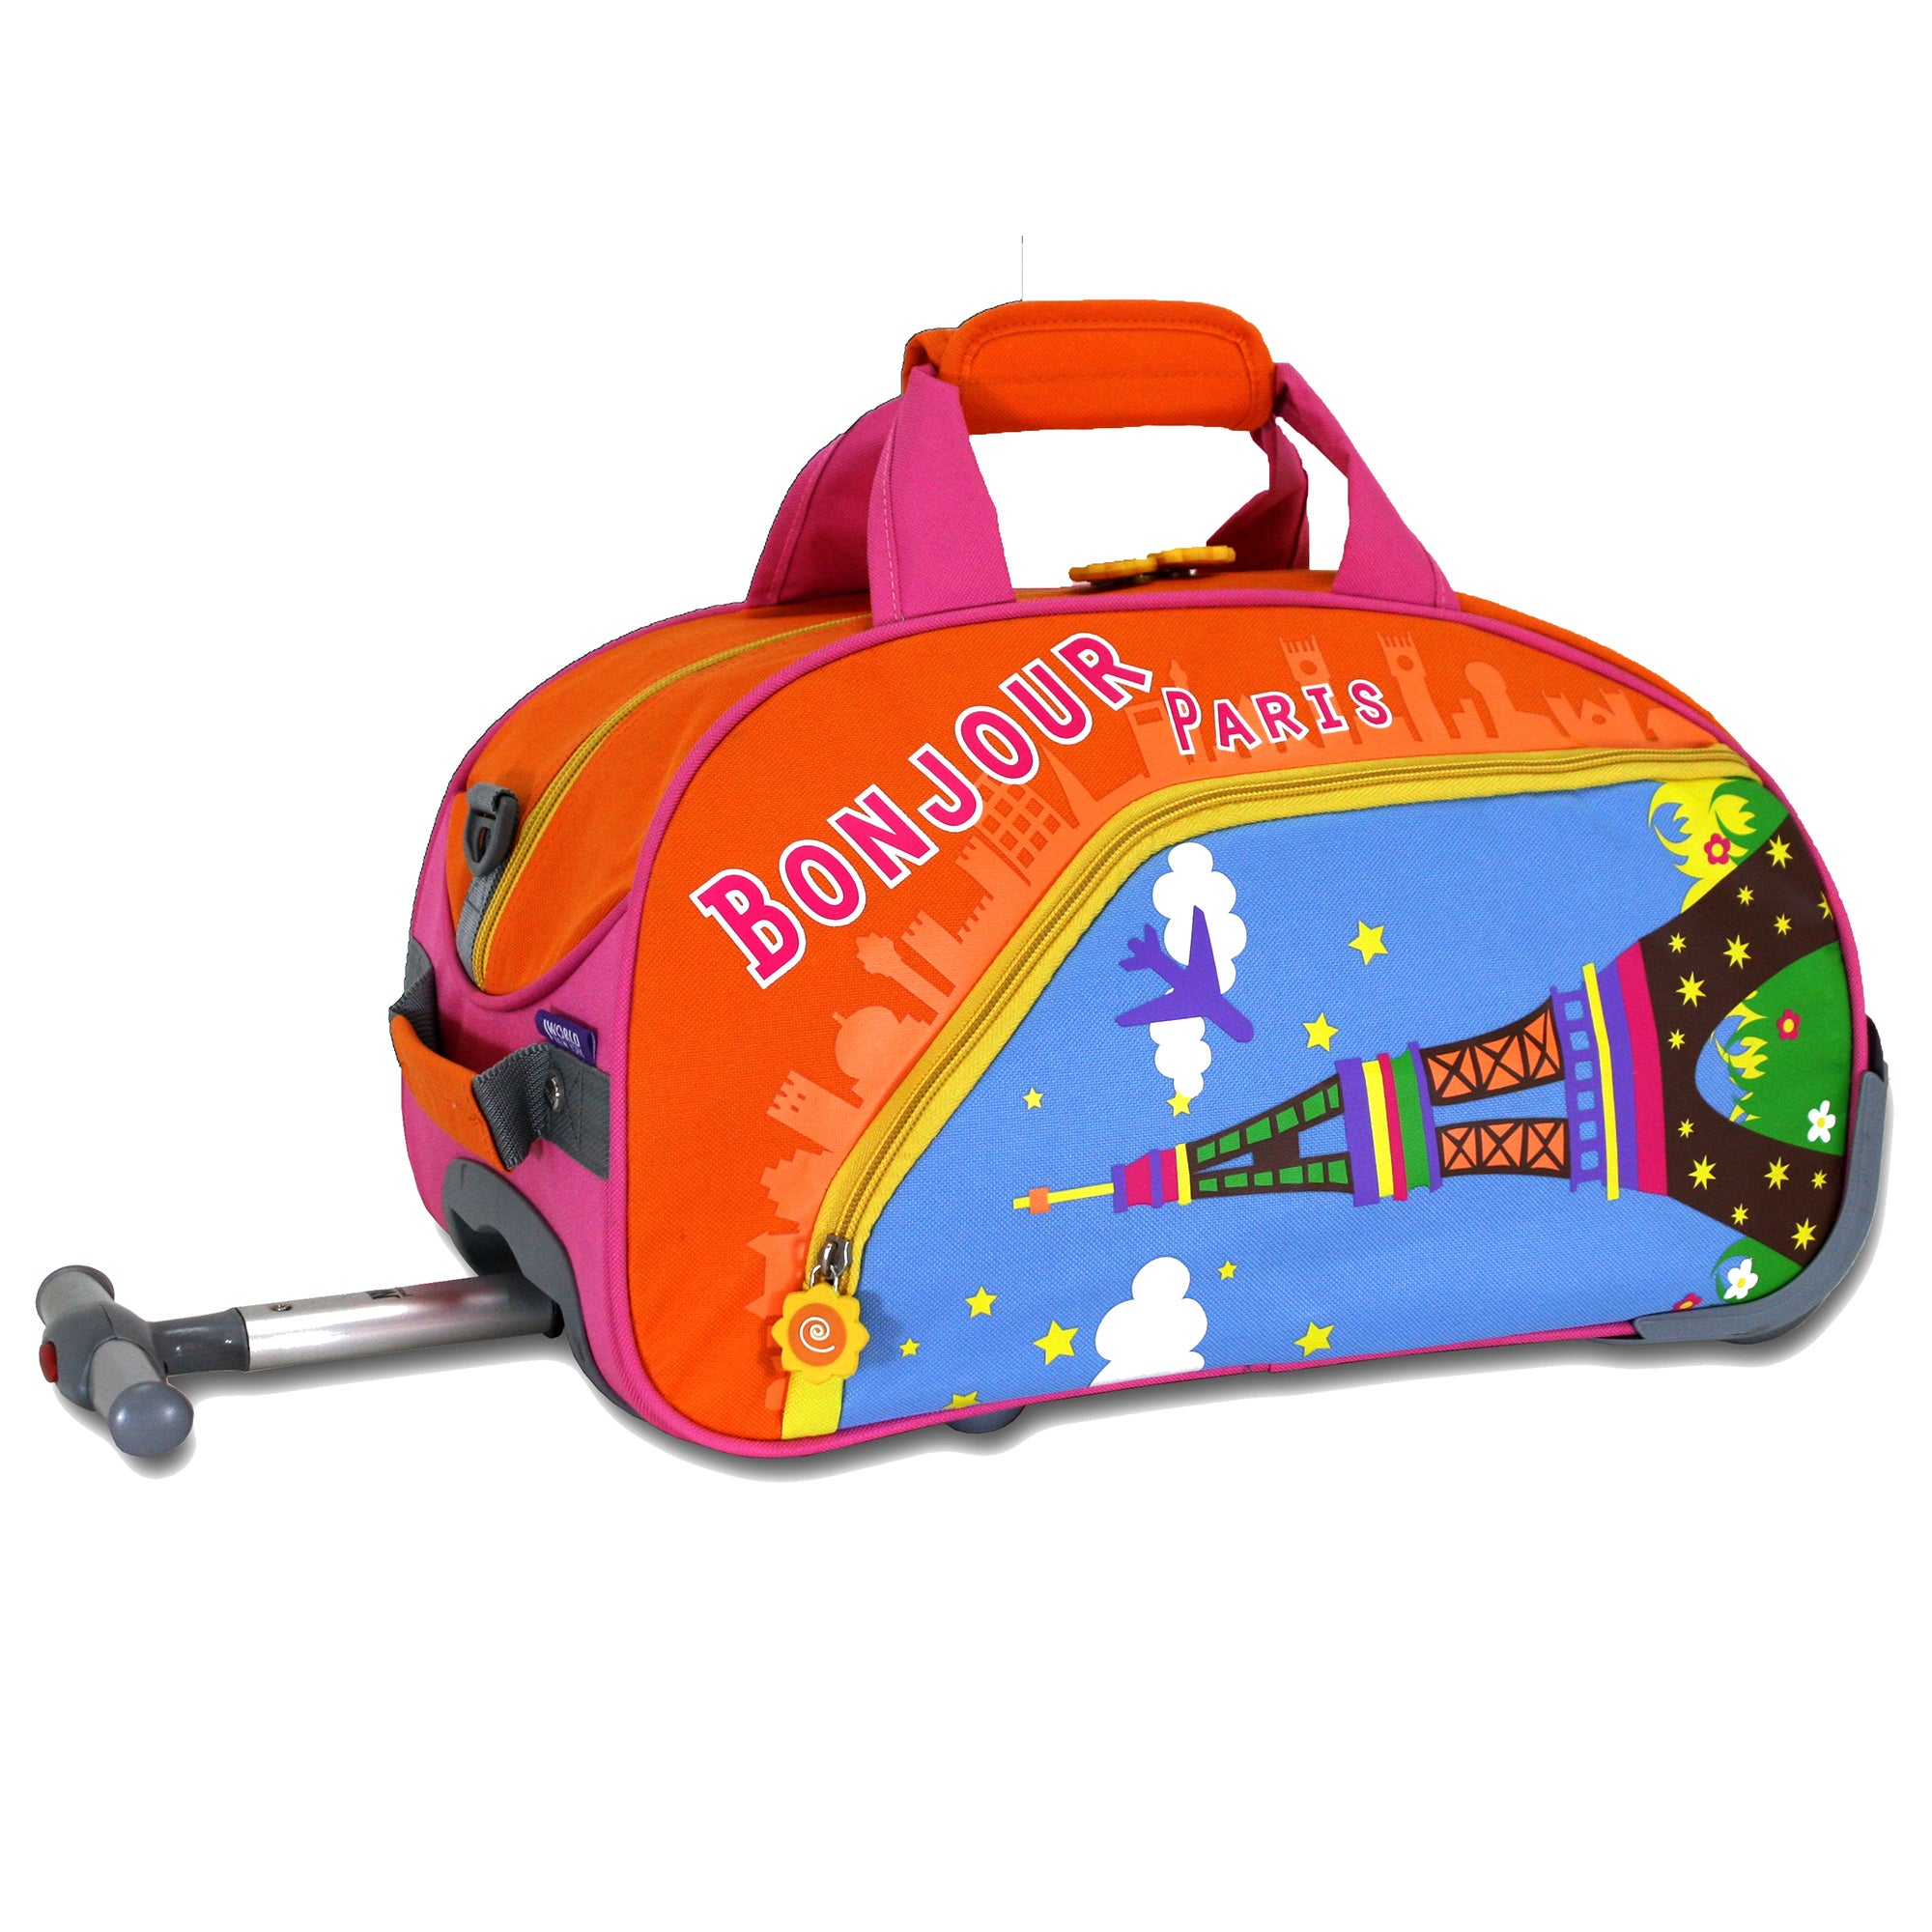 J World Paris Kids 17-inch Rolling Duffel Bag (Paris), Or...